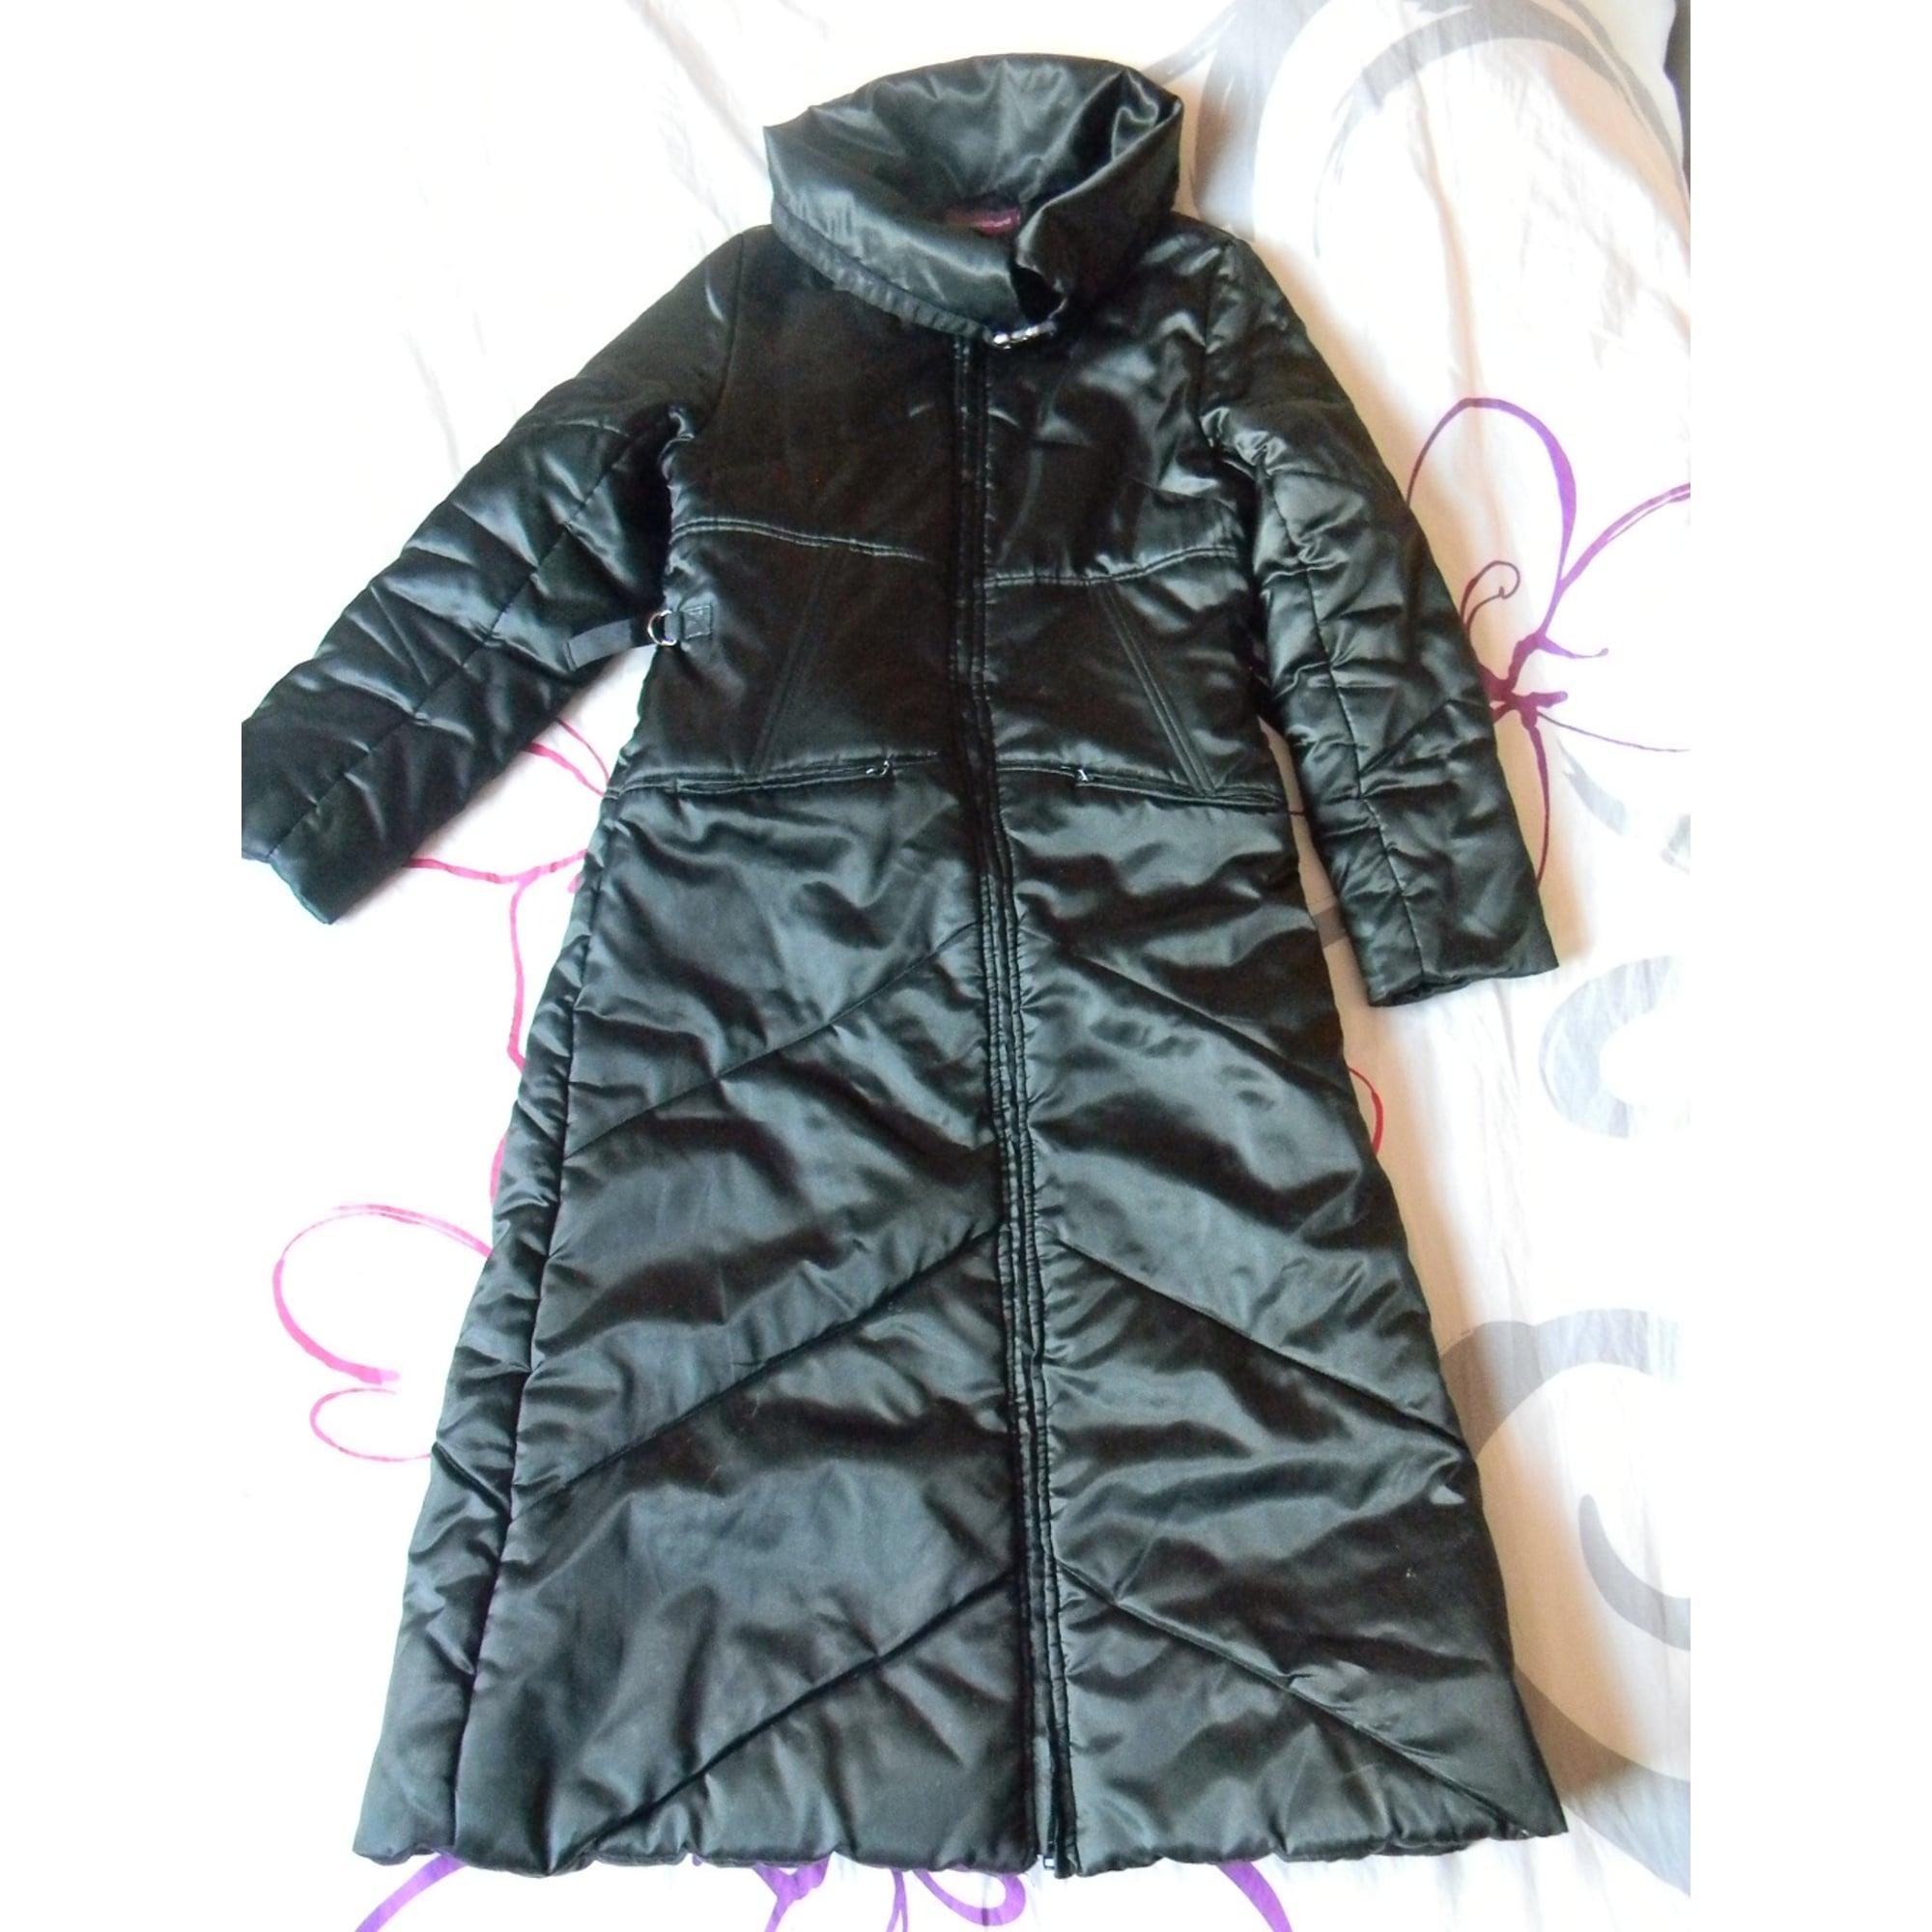 Doudoune CAROLE RICHARD 36 (S, T1) noir - 536483 dd3fc66cf8b0